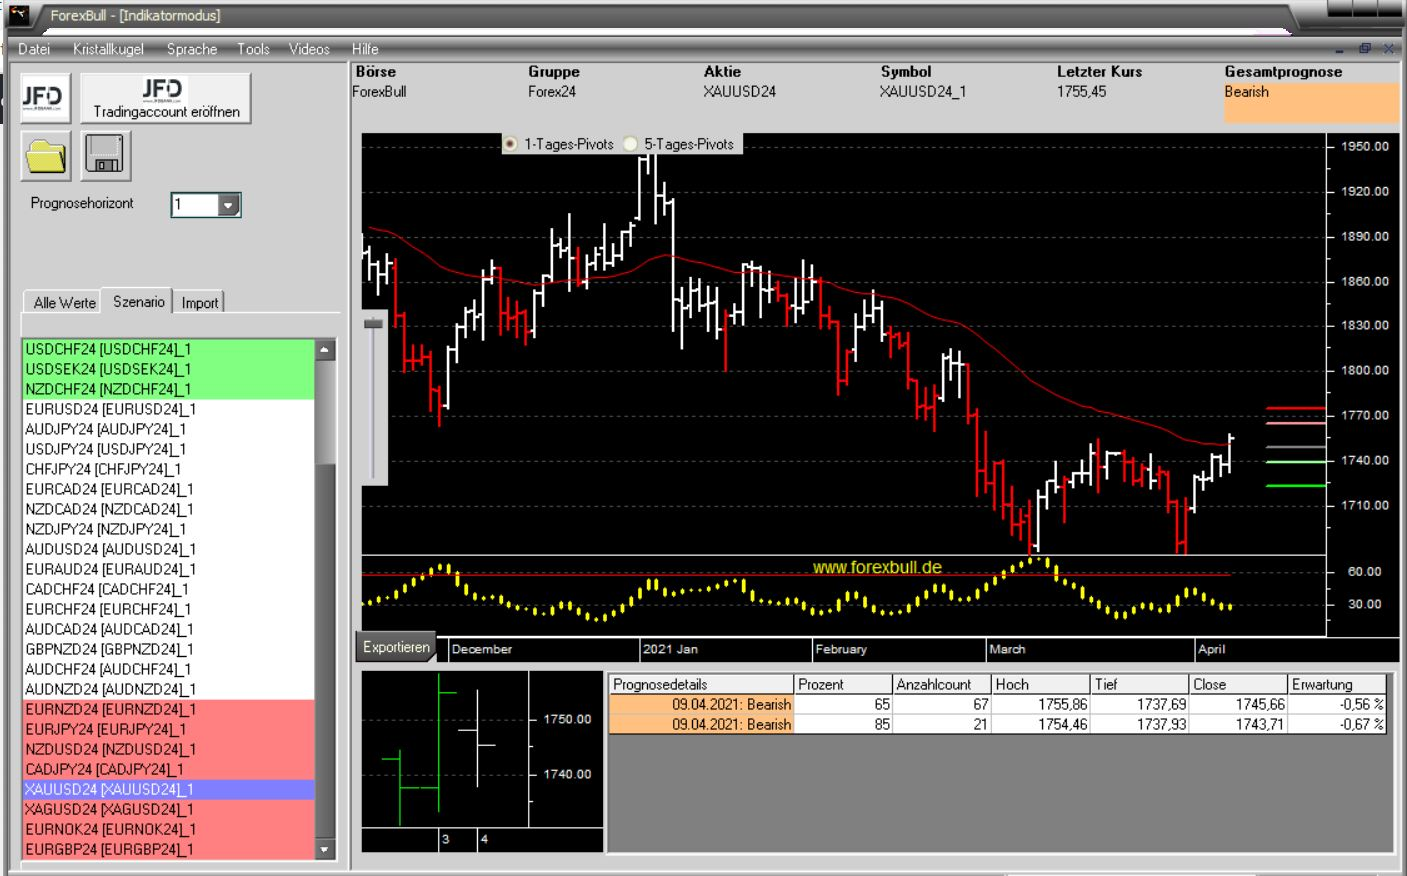 Morning-Briefing-ForexBull-GBP-USD-CAD-Gold-auf-dem-Radar-Chartanalyse-JFD-Bank-GodmodeTrader.de-2